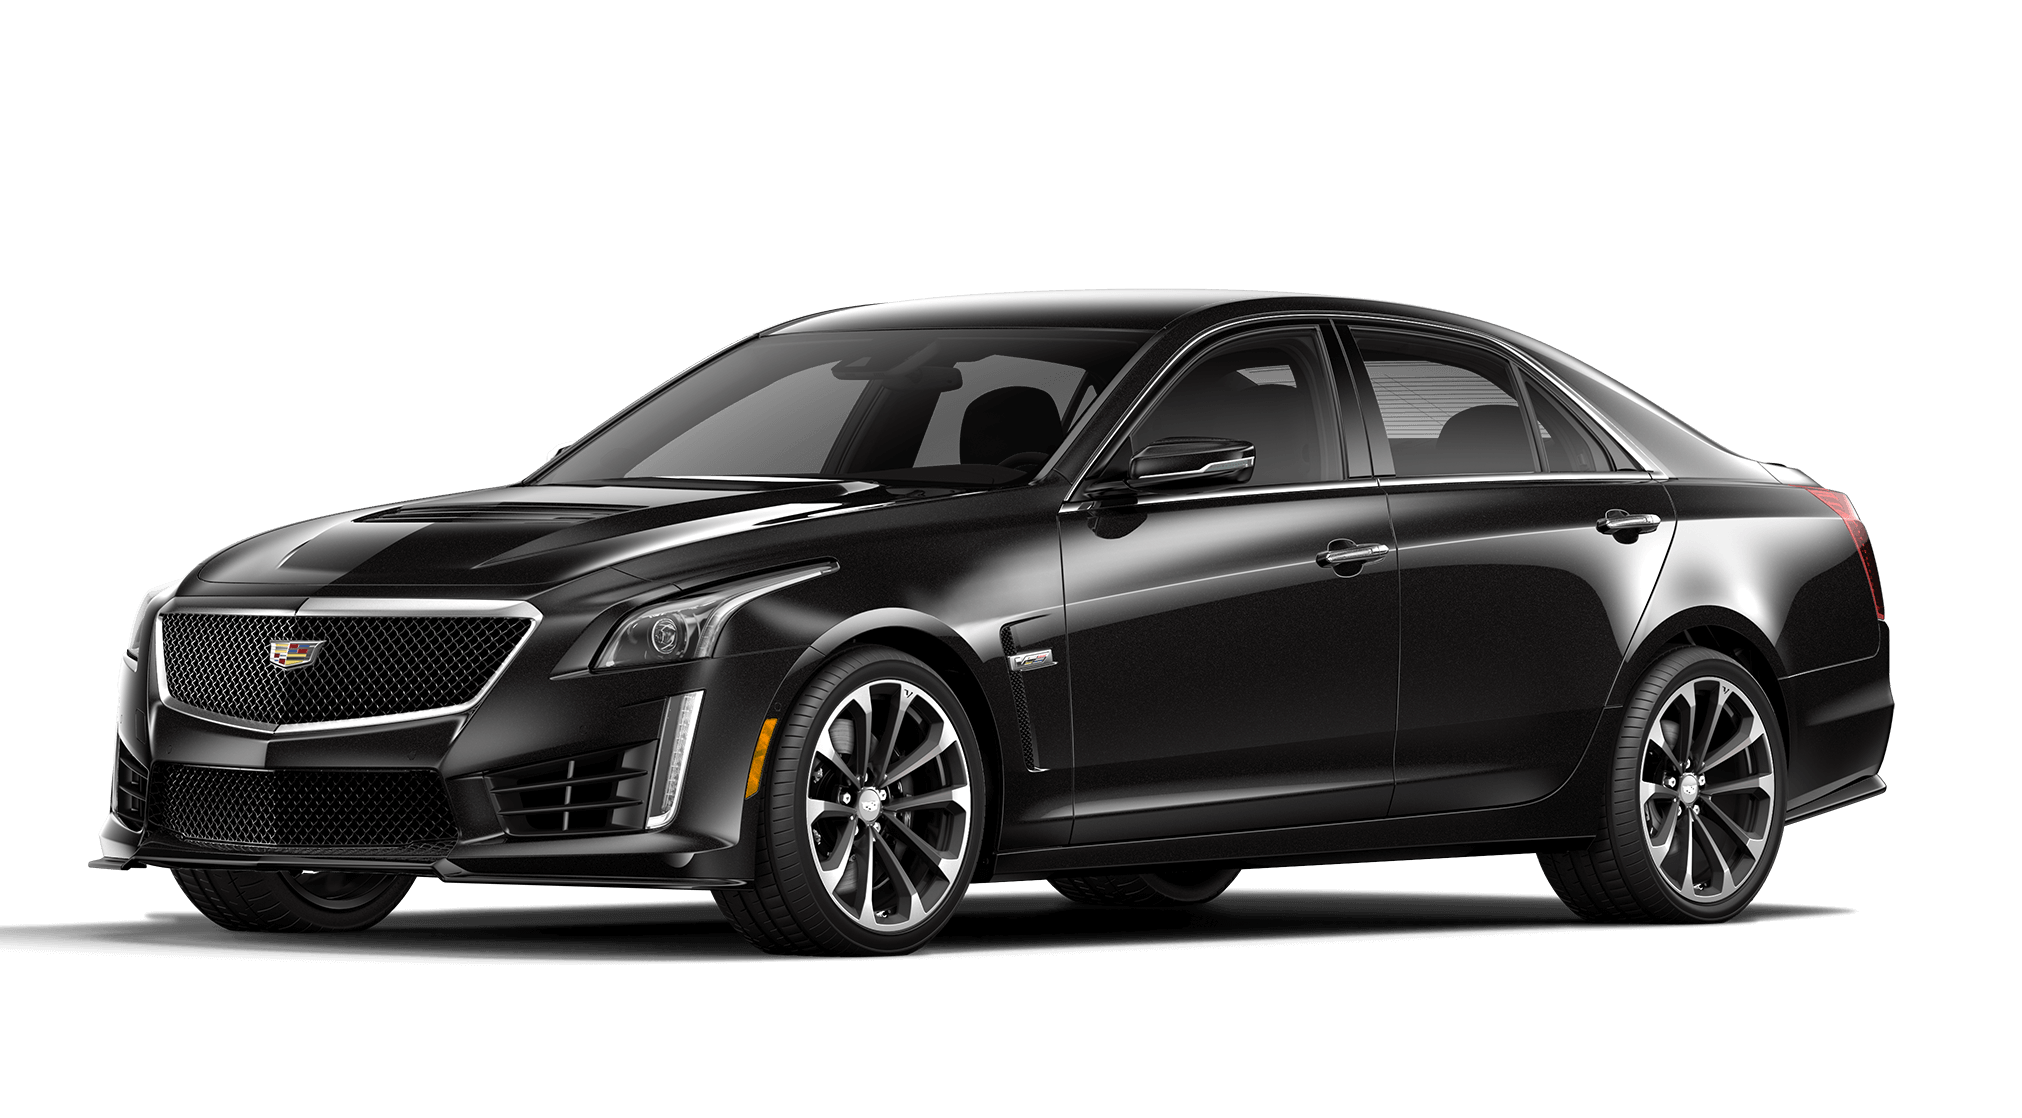 Stellar Black Metallic Cadillac CTS-V